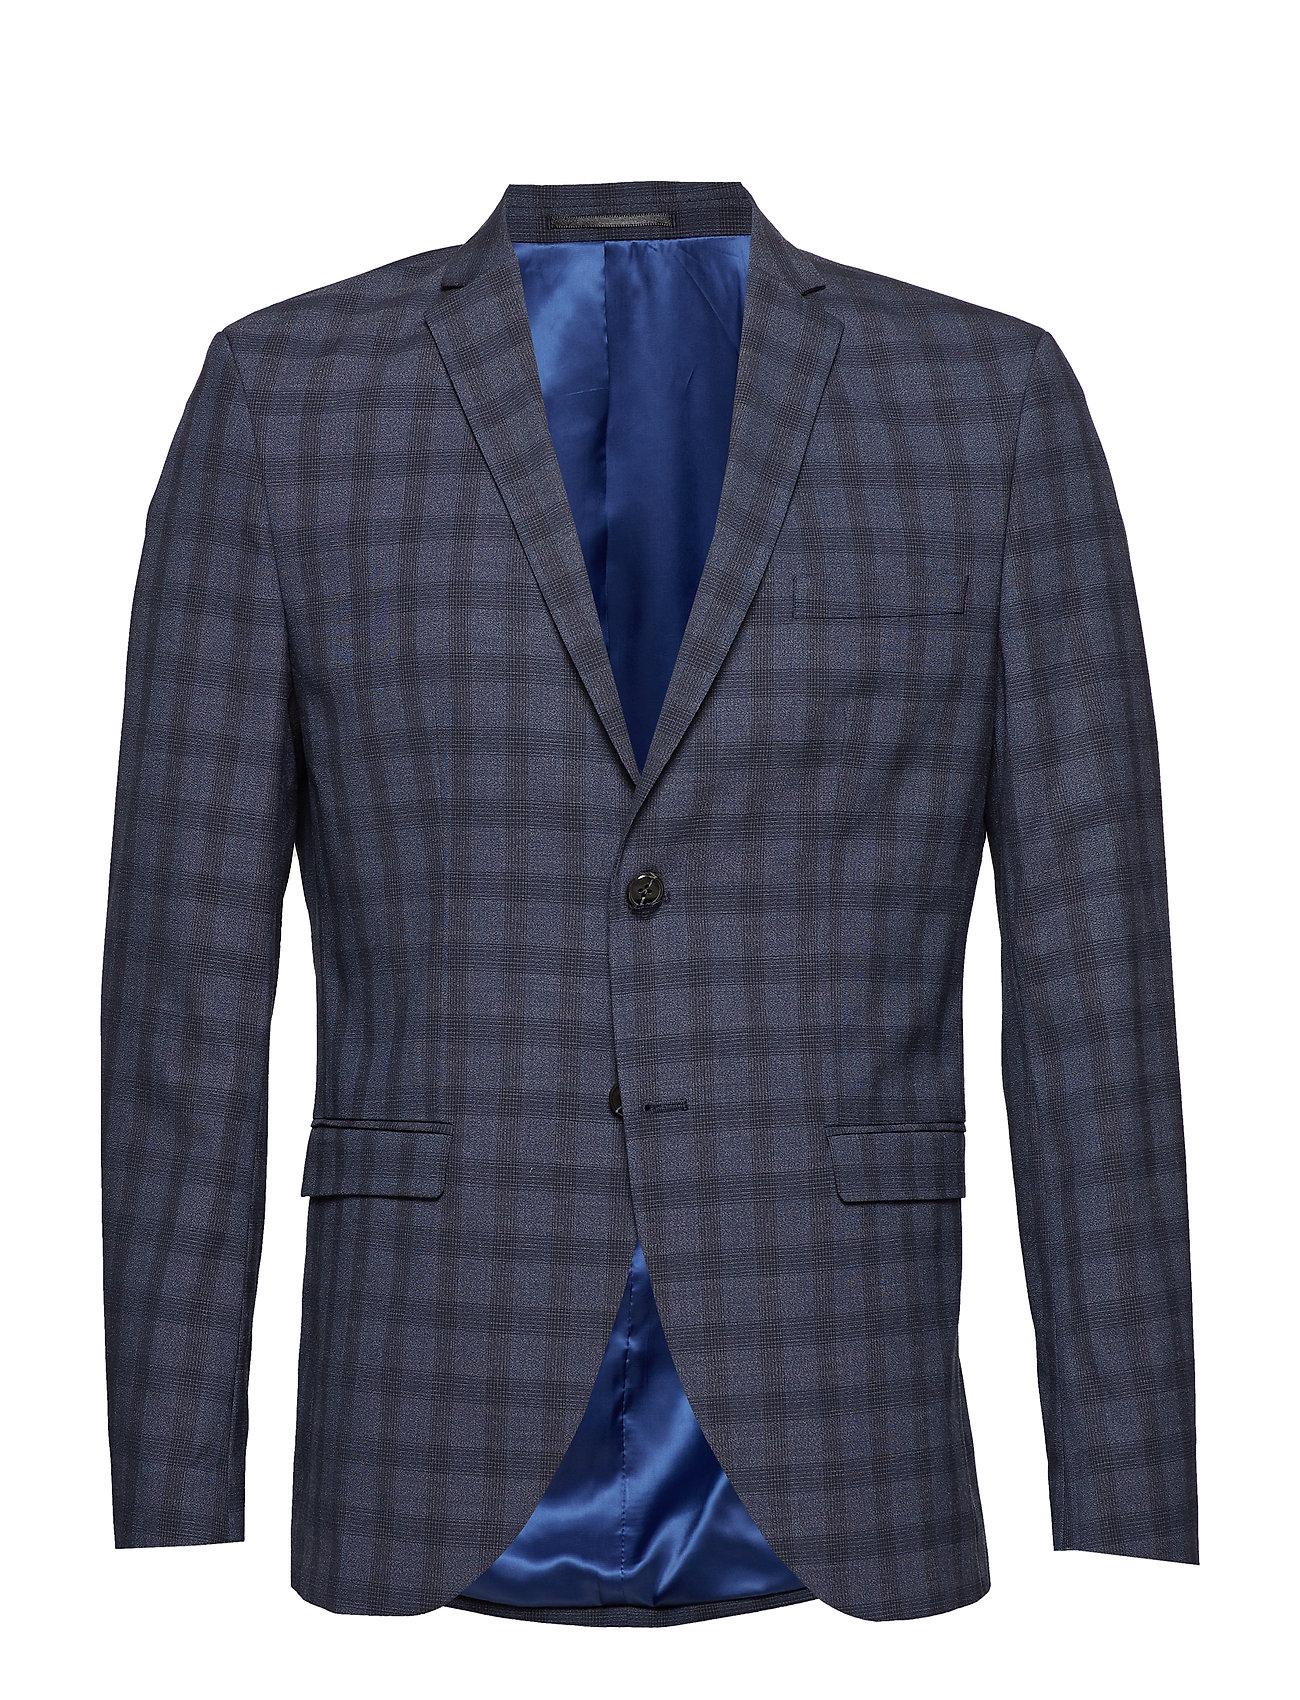 Selected Homme SLHSLIM-MYLOLOGAN NAVY CHECK BLZ B NOOS - NAVY BLUE